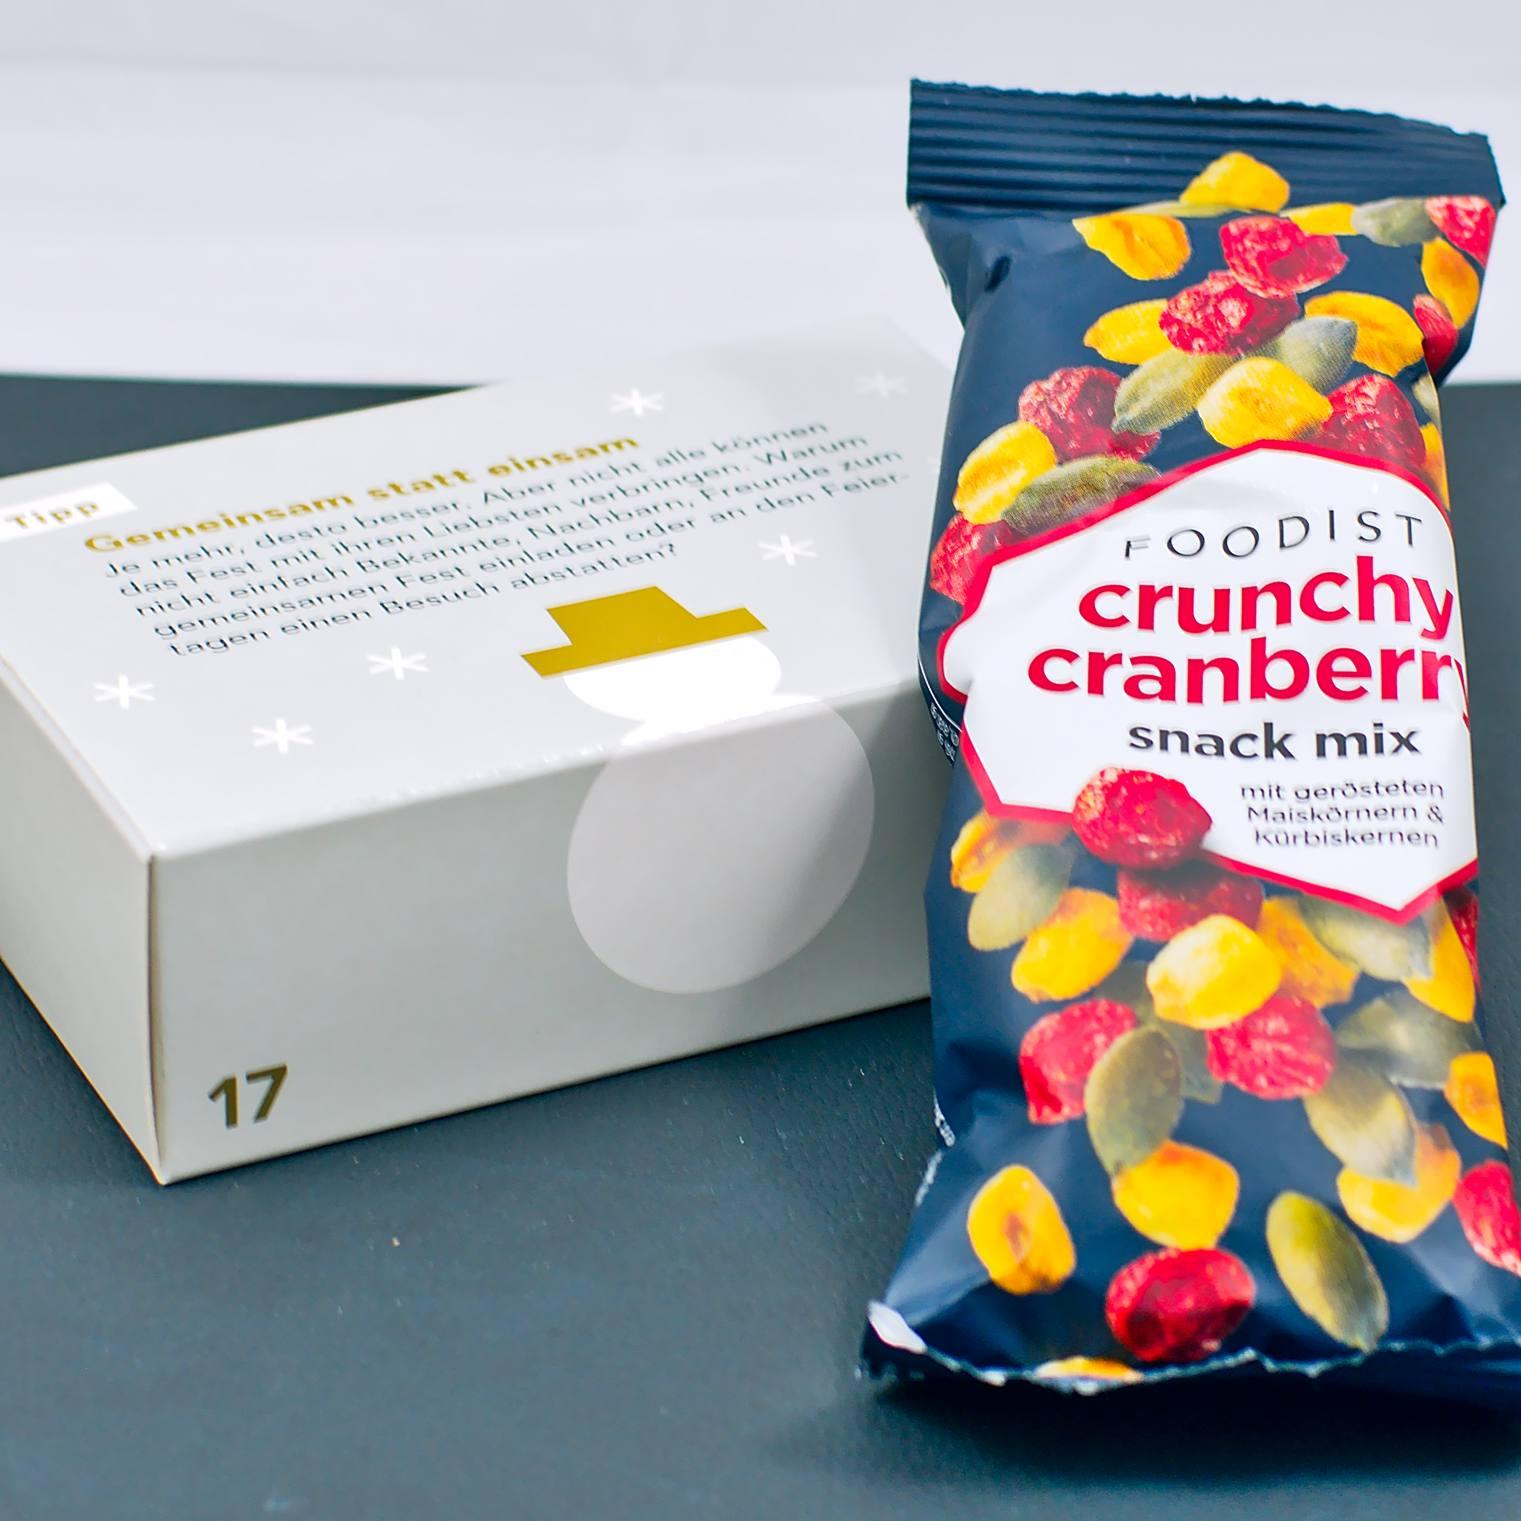 Crunchy Cranberry Snack Mix Maiskörner & Kürbiskerne | 17. Türchen